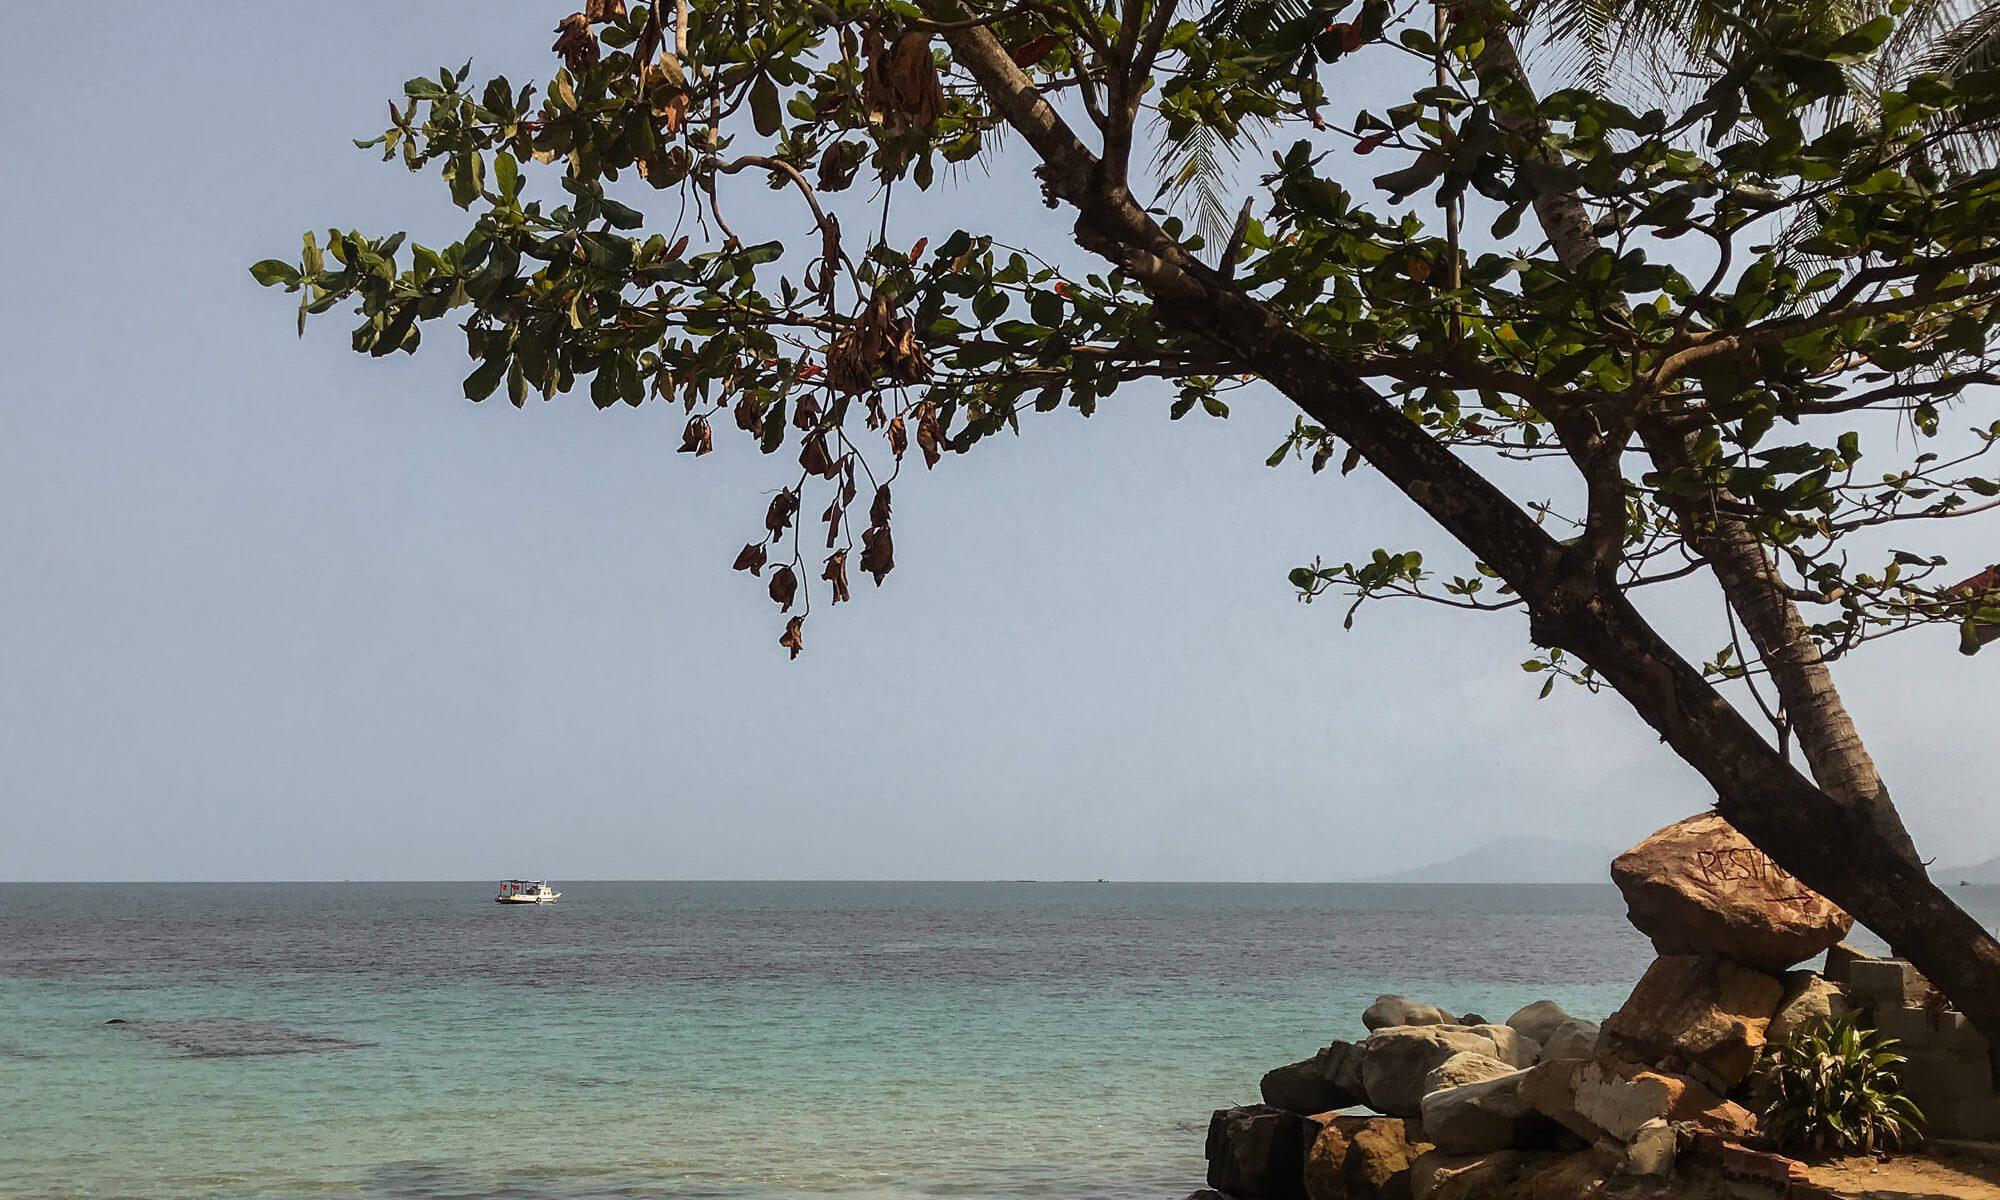 View on Phu QUoc Island